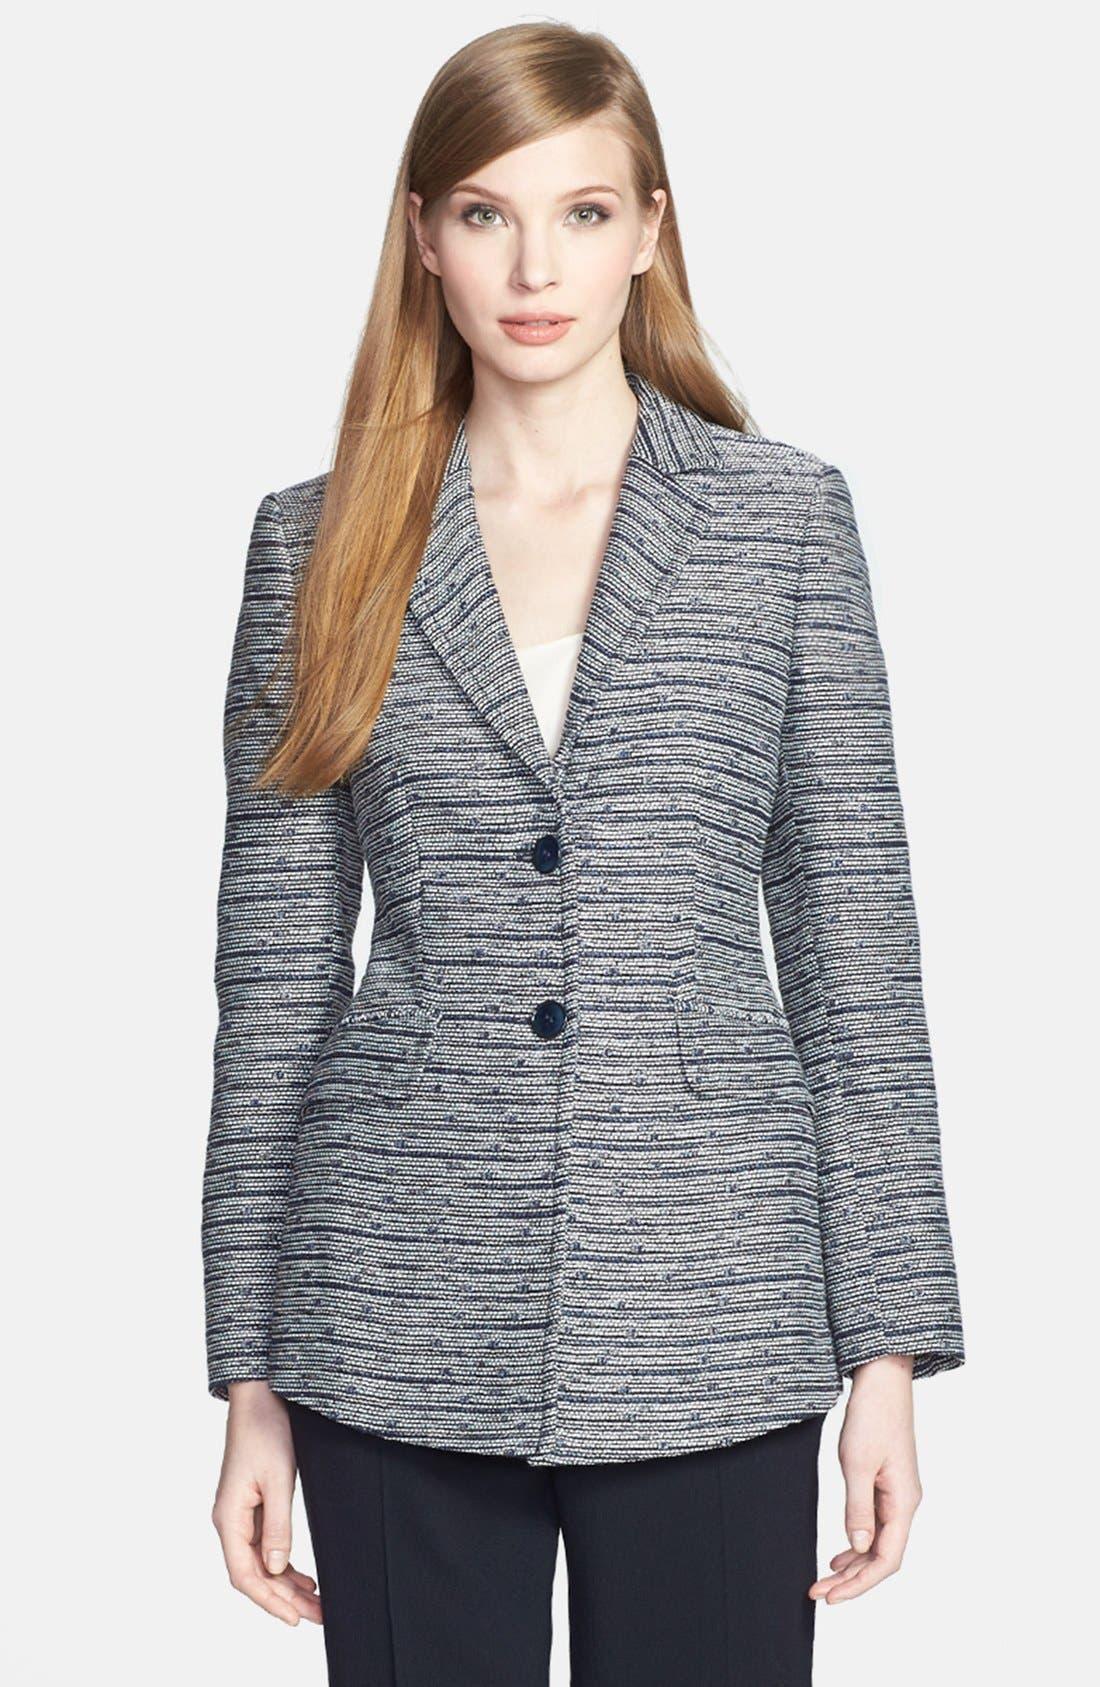 Main Image - Santorelli Tweed Jacket